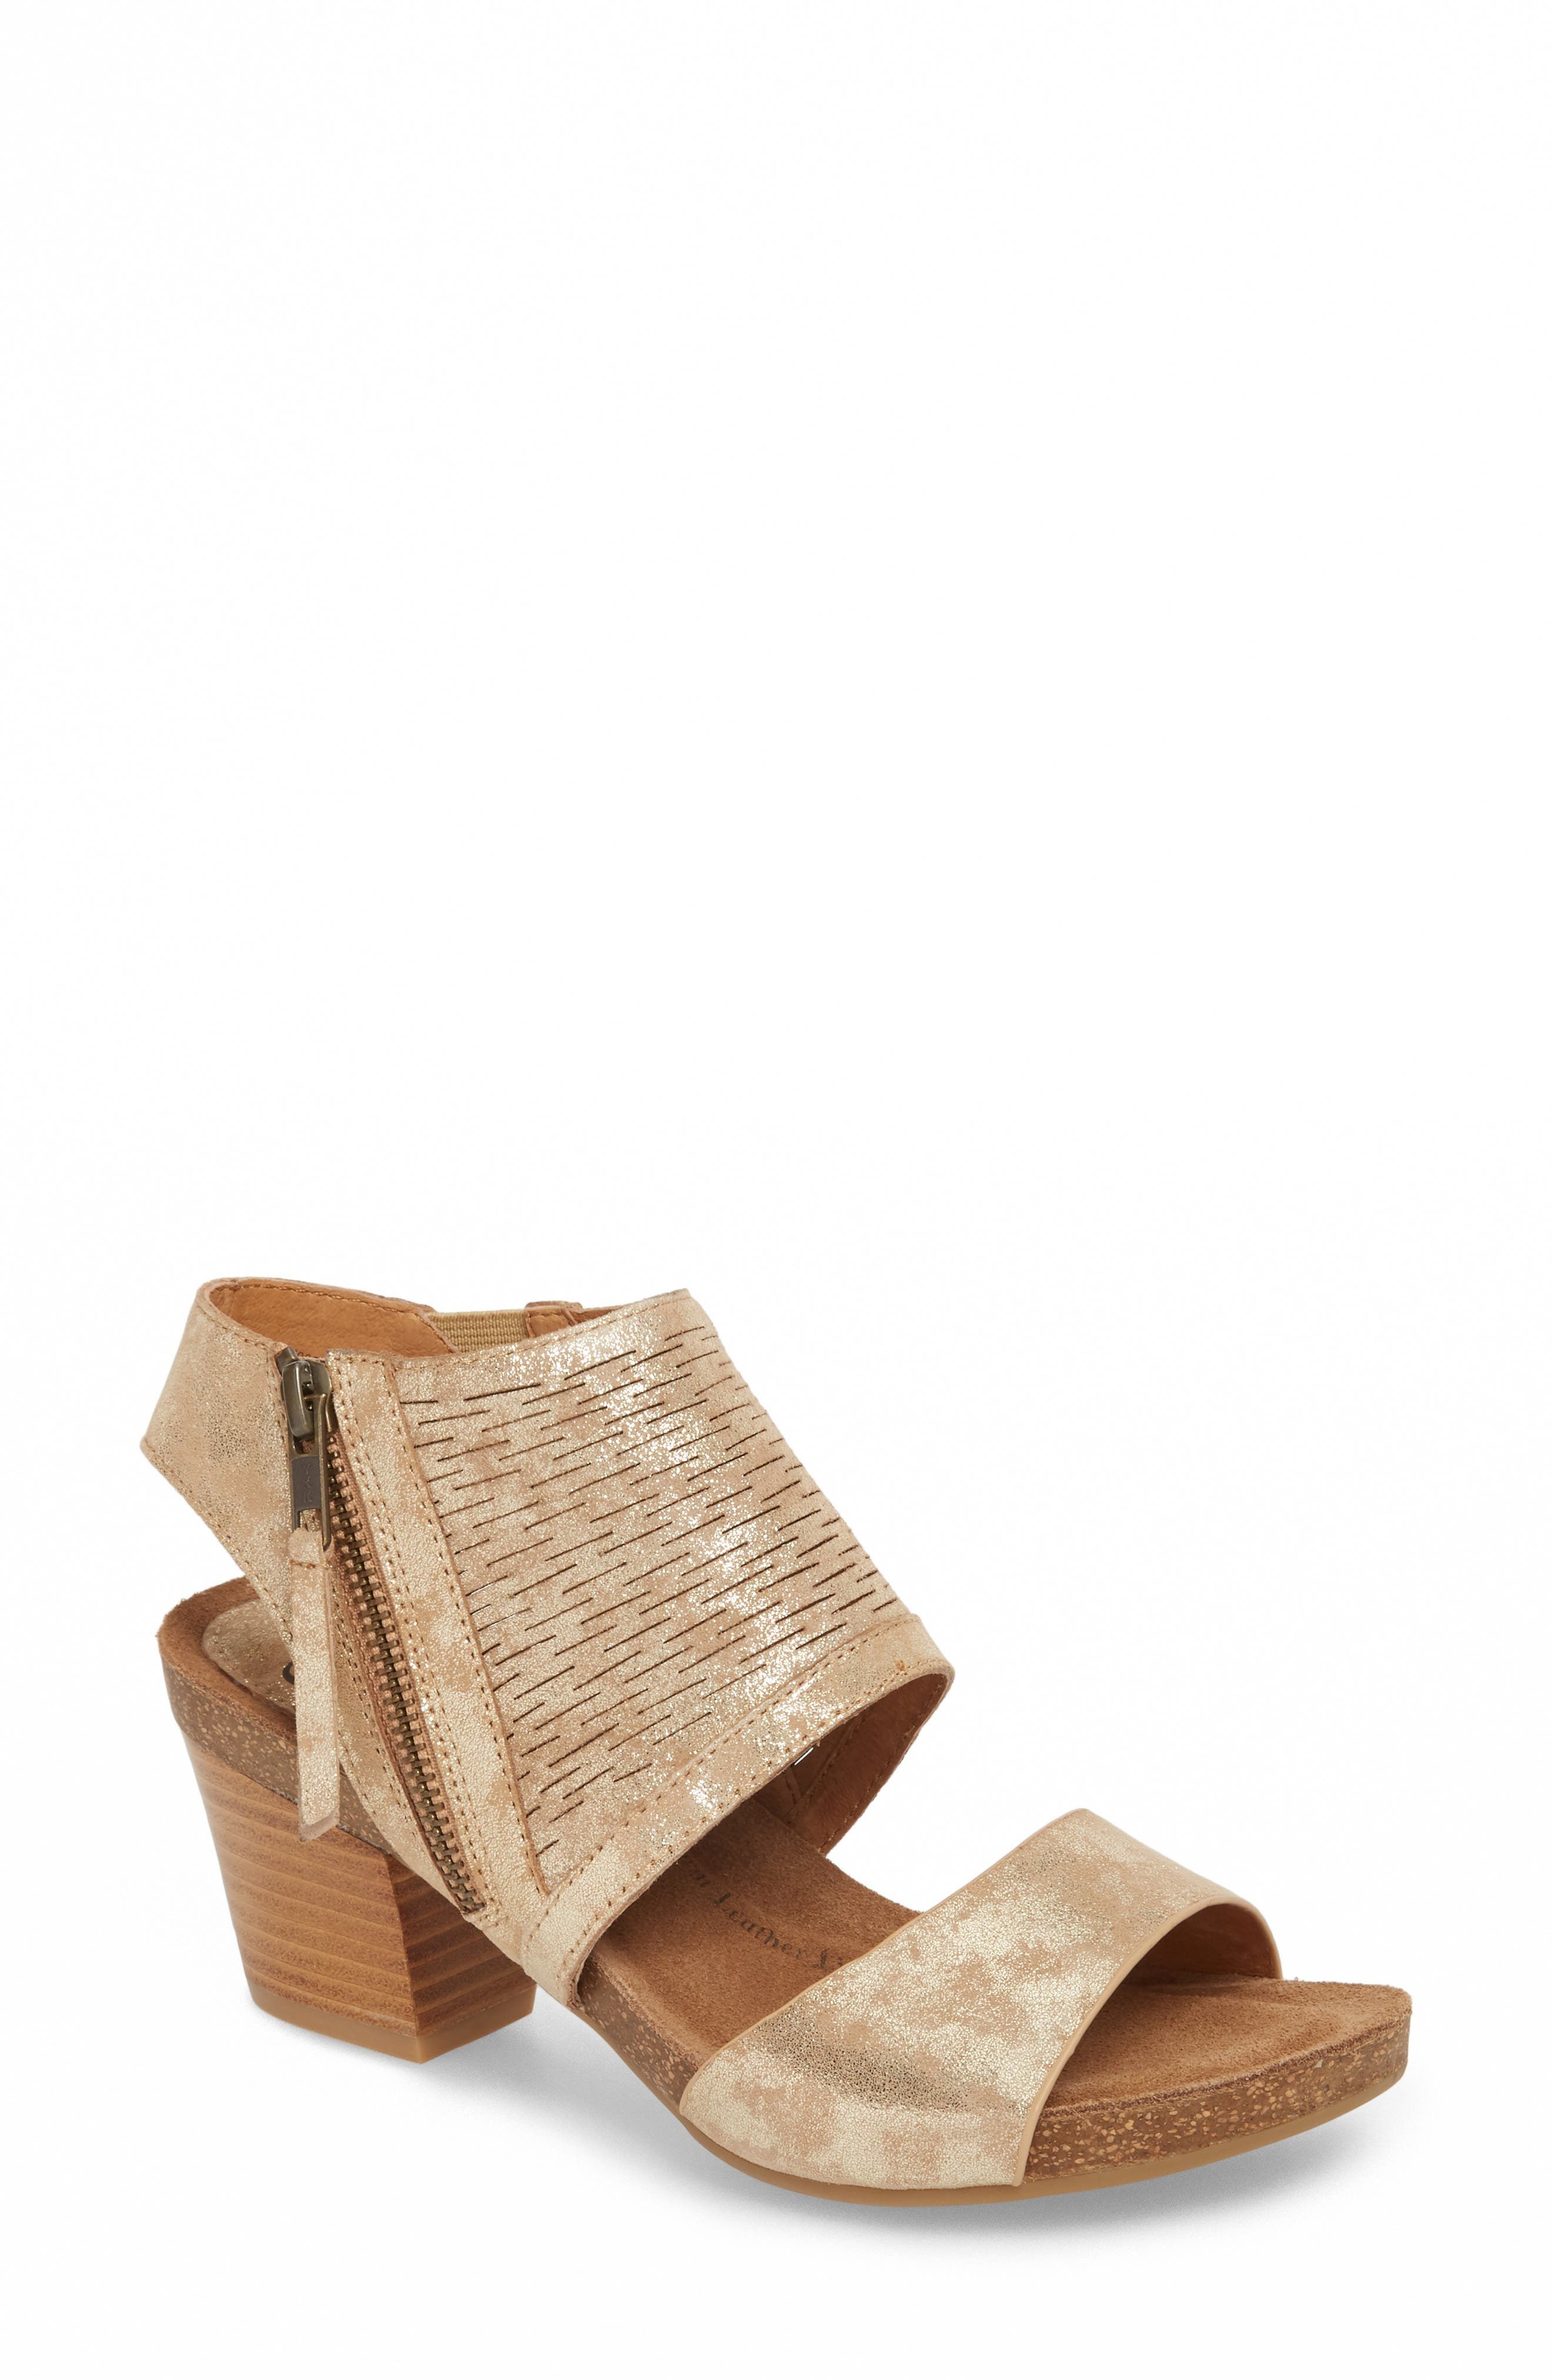 Milan Block Heel Sandal,                             Main thumbnail 1, color,                             040